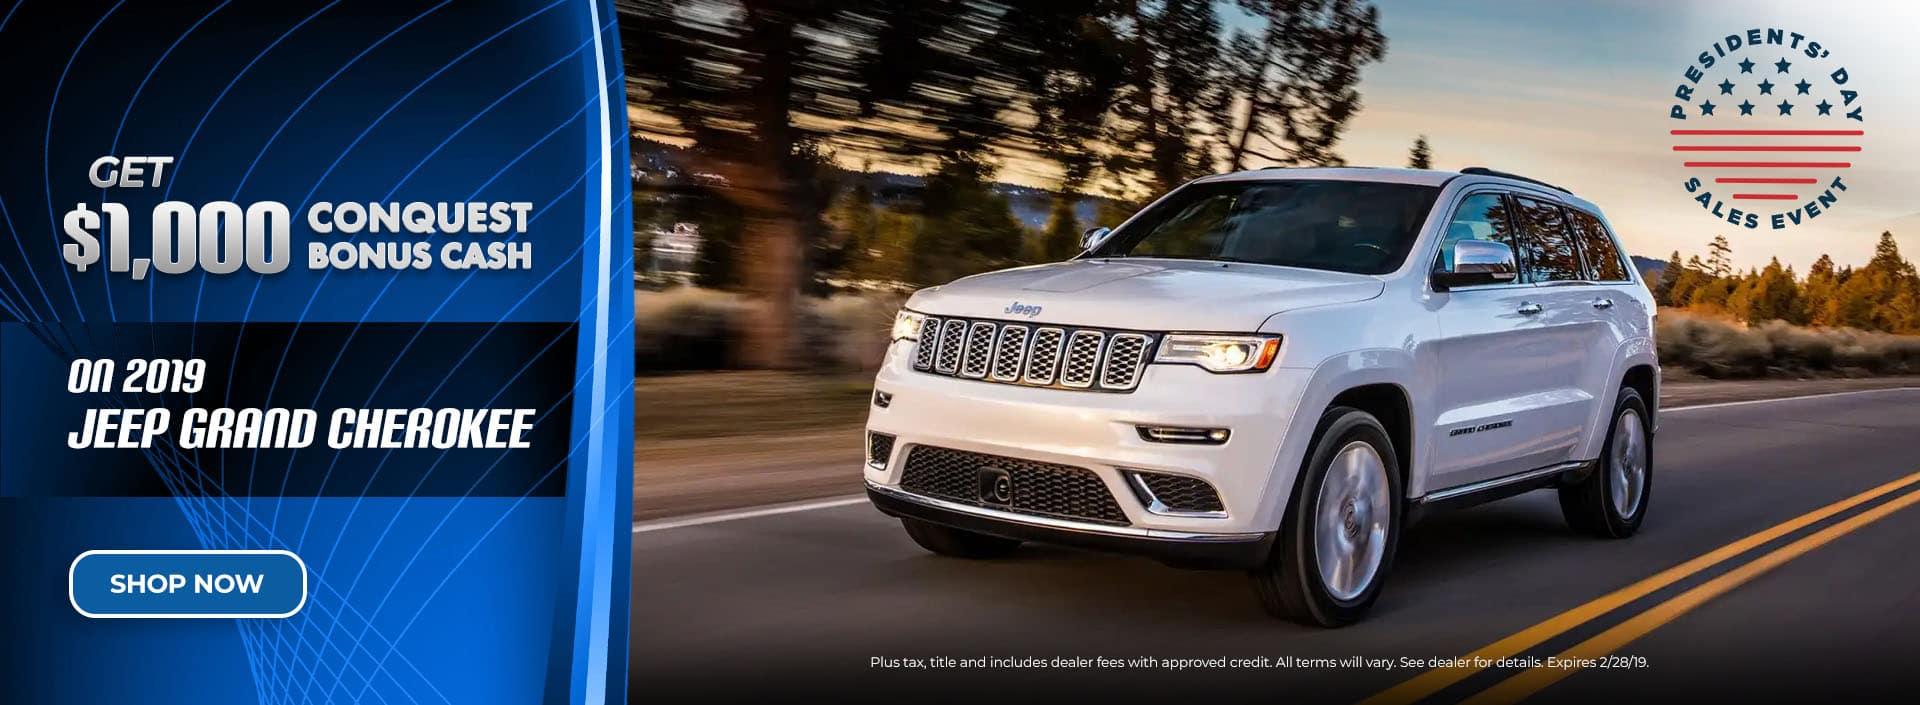 jeep grande cherokee marietta ga